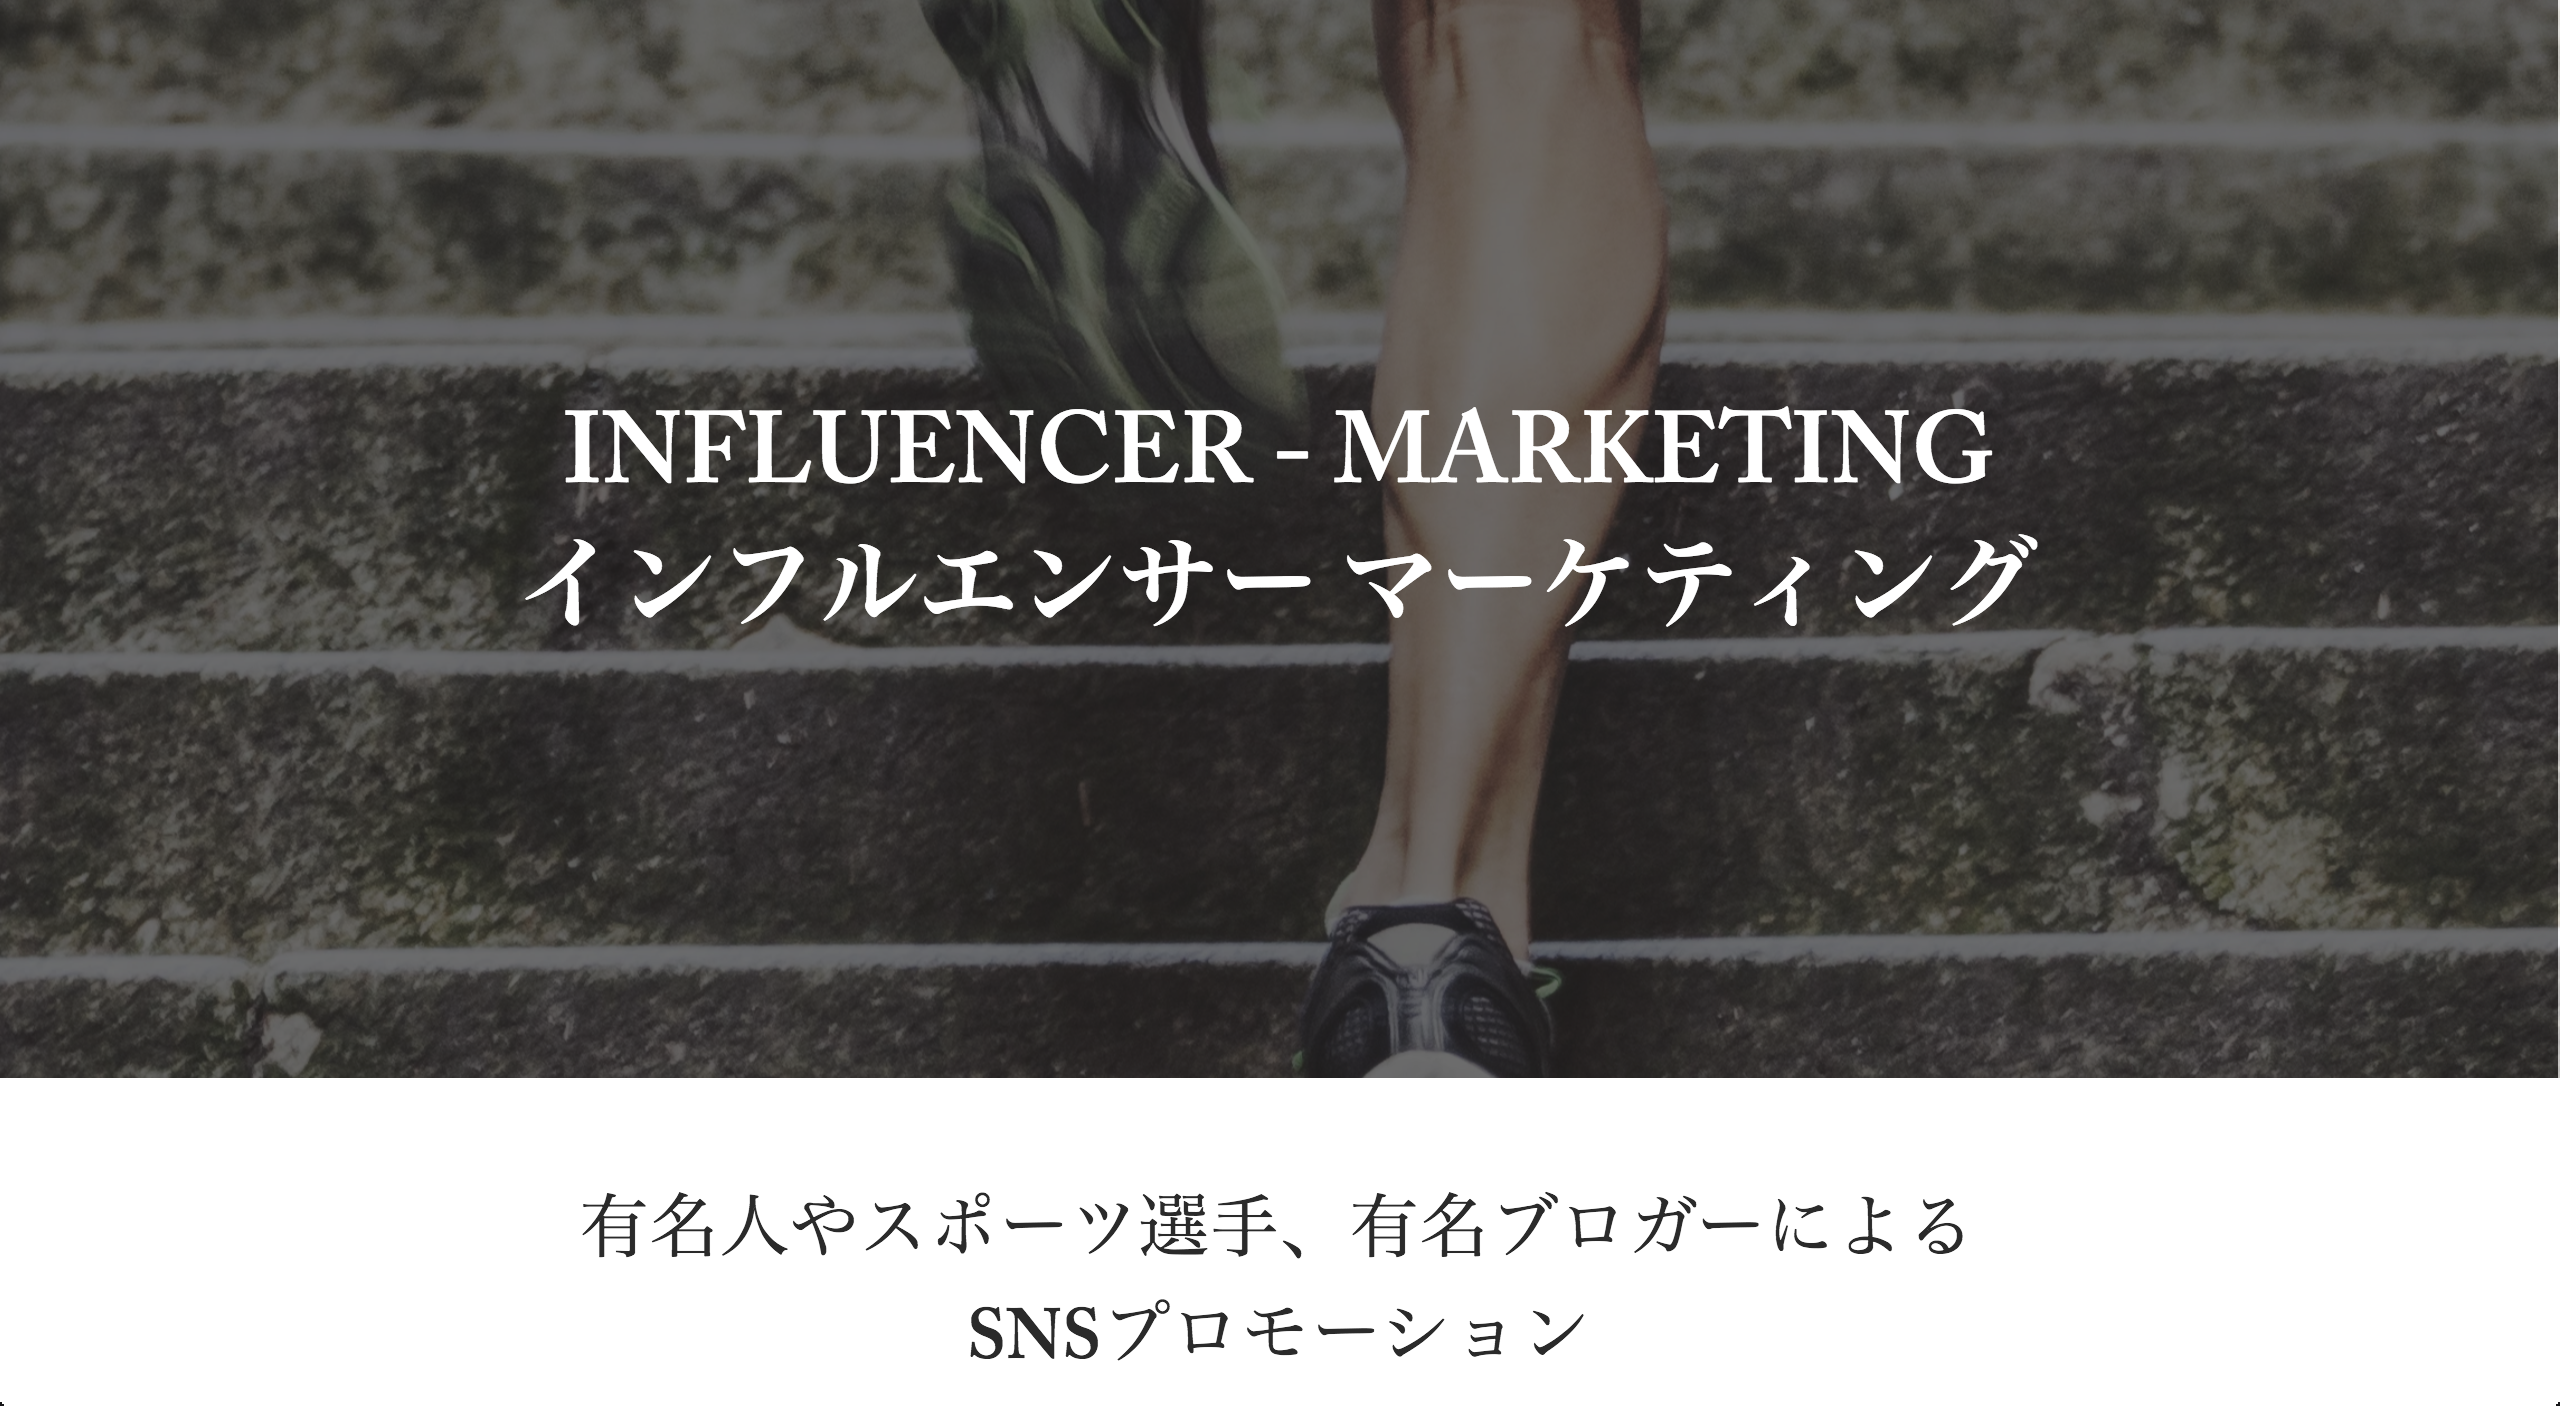 Influencer - Marketing